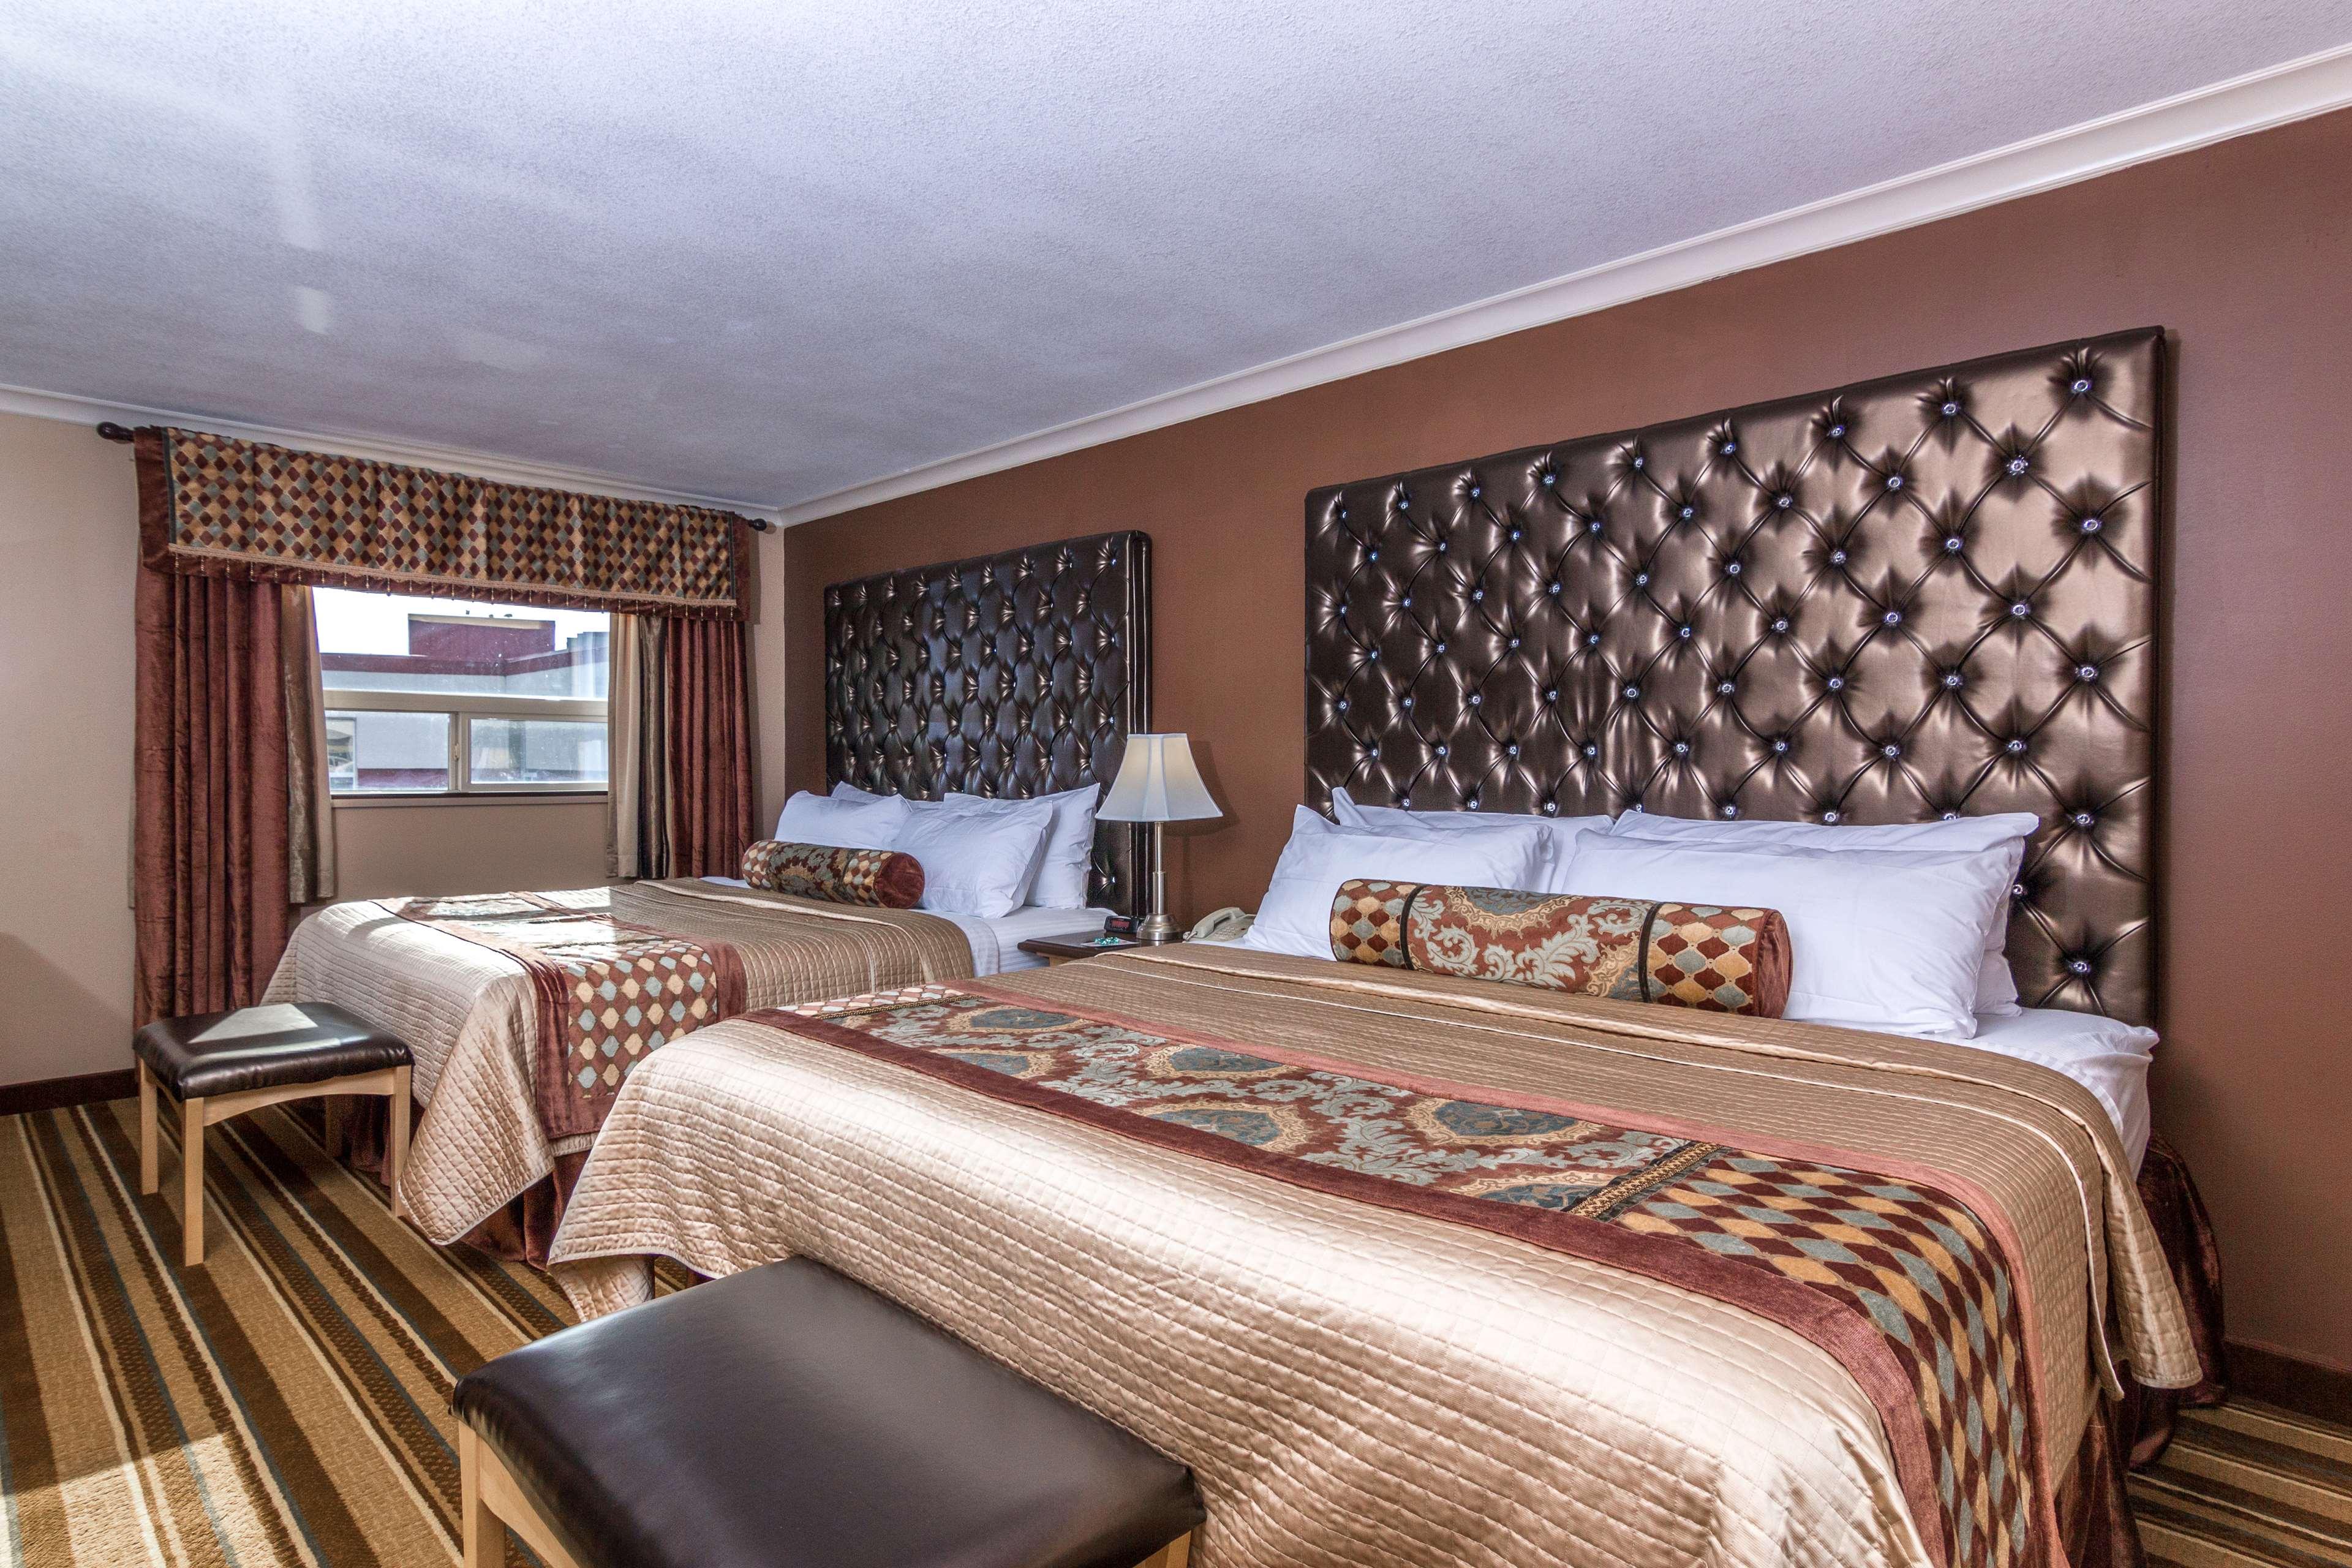 Best Western Marquis Inn & Suites in Prince Albert: Two King Beds